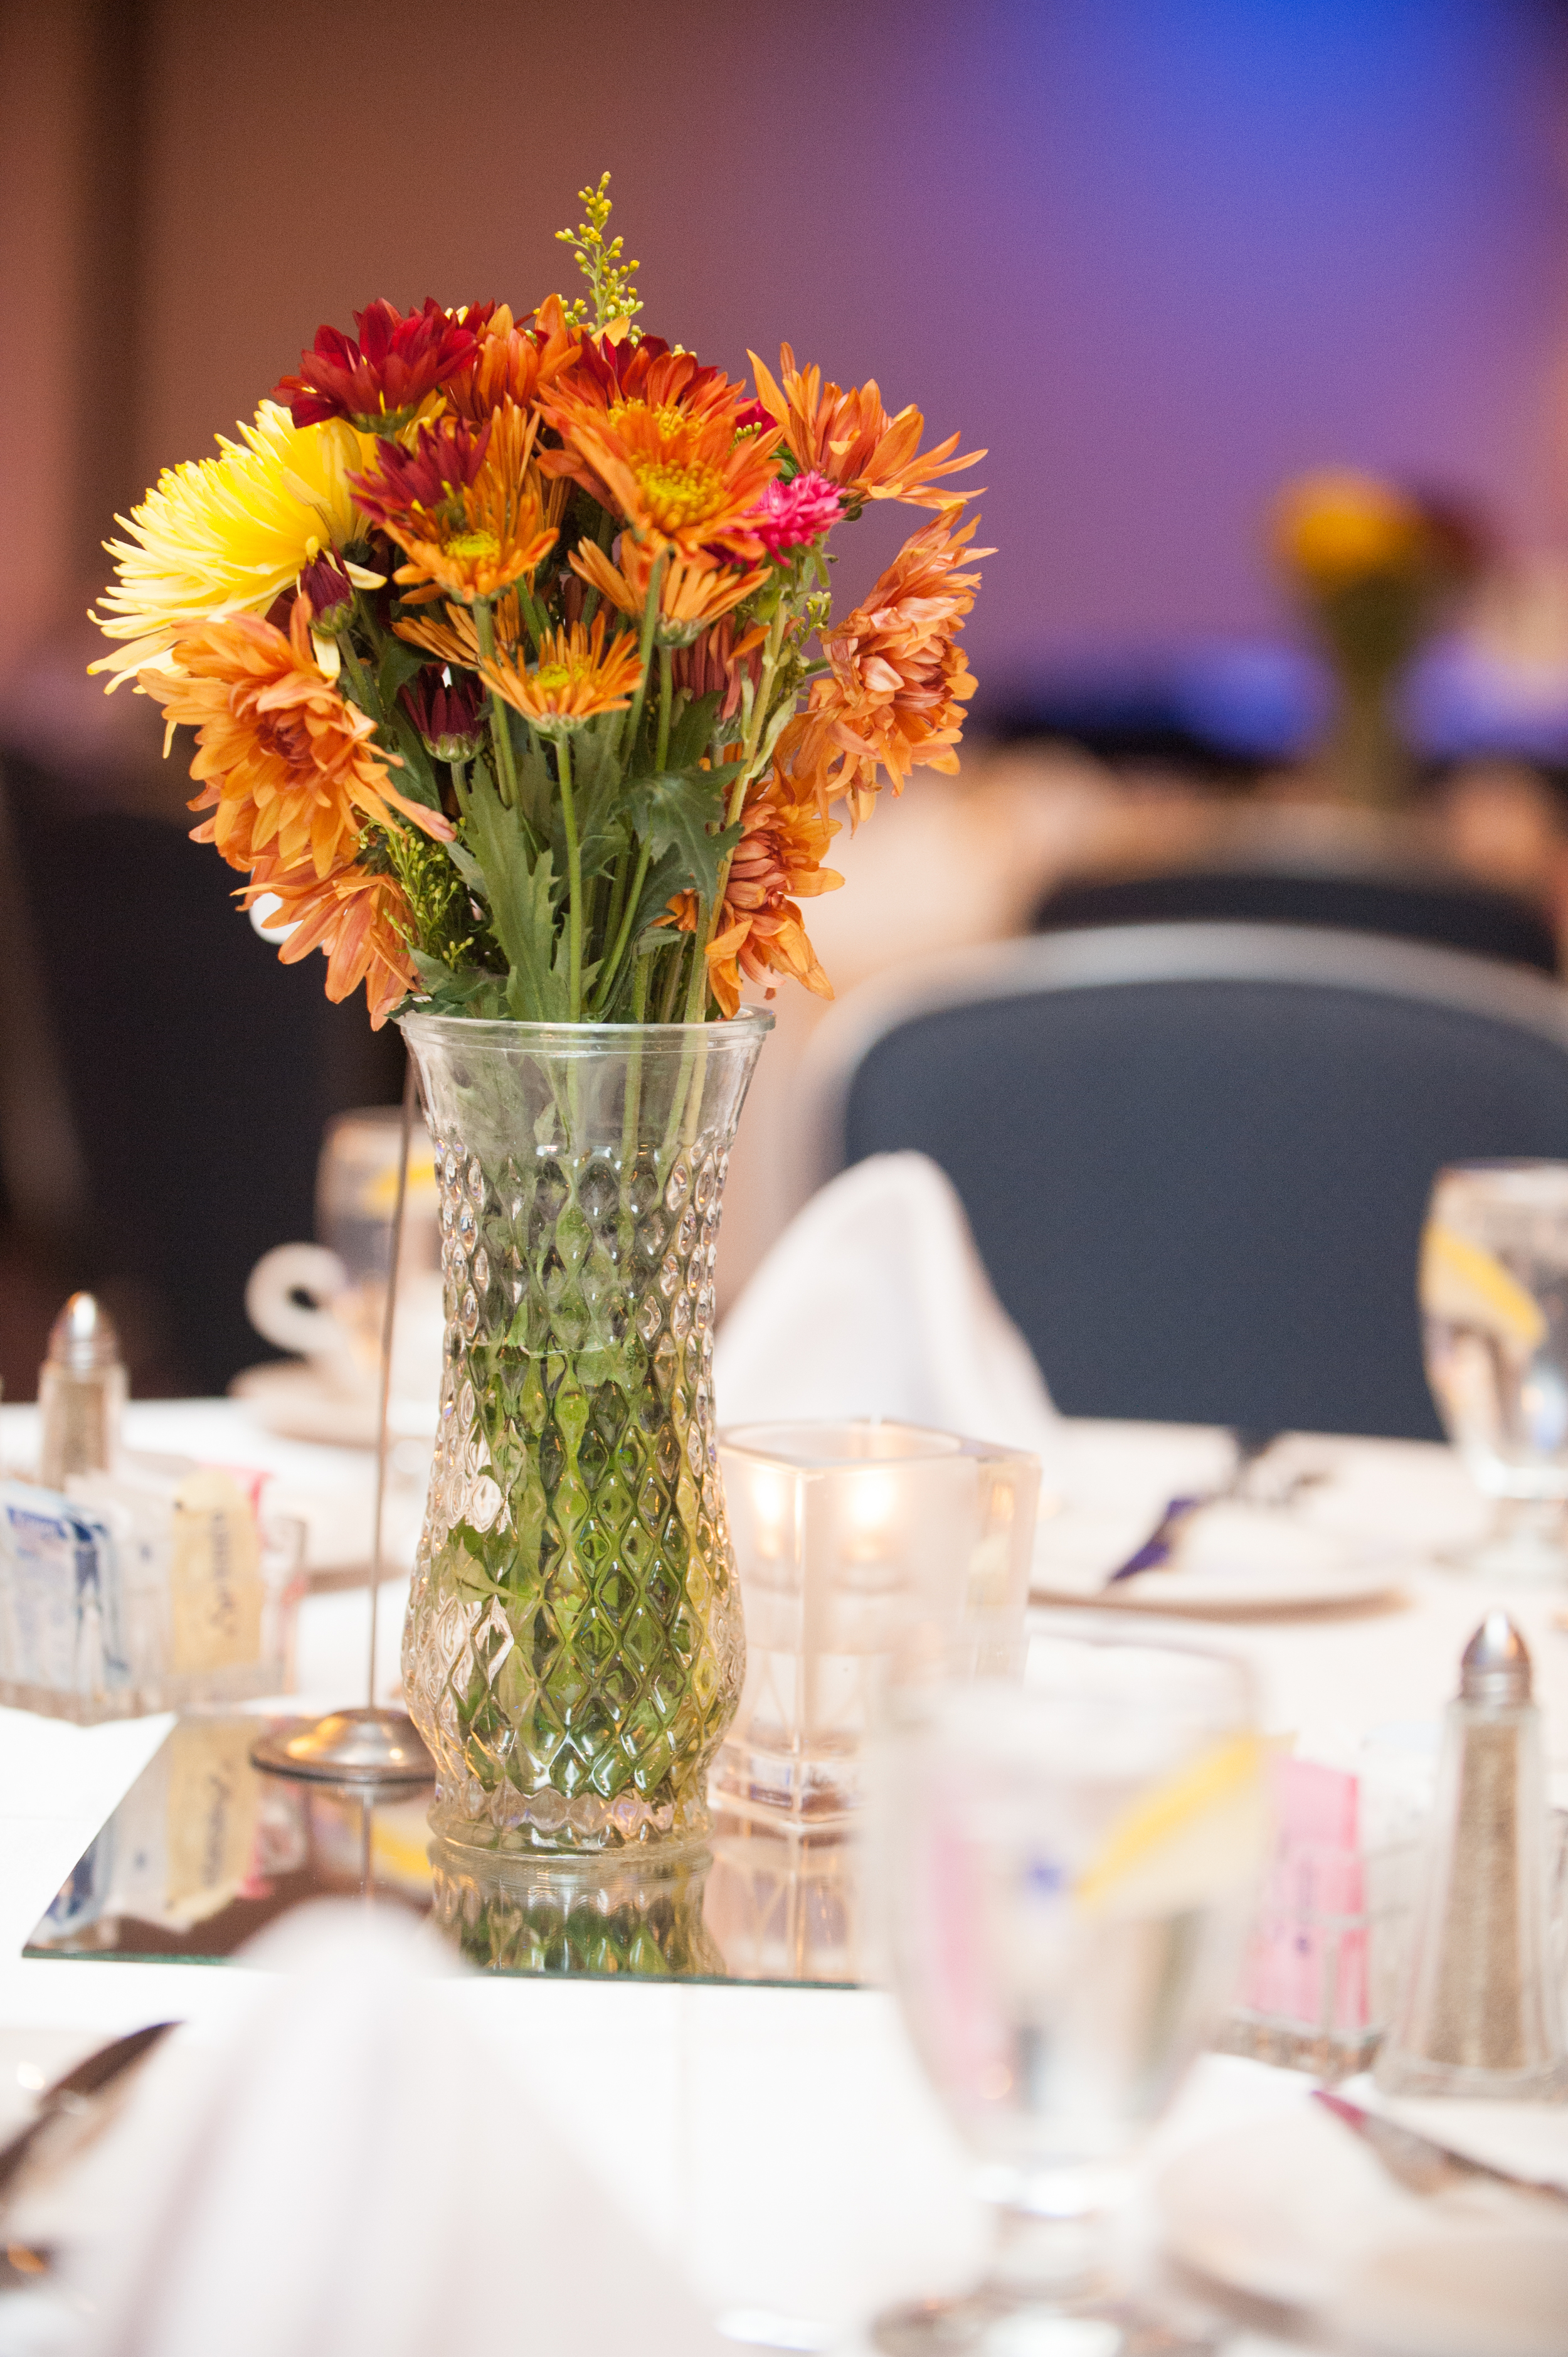 2014-11-15-ABACS Annual Dinner-41.jpg